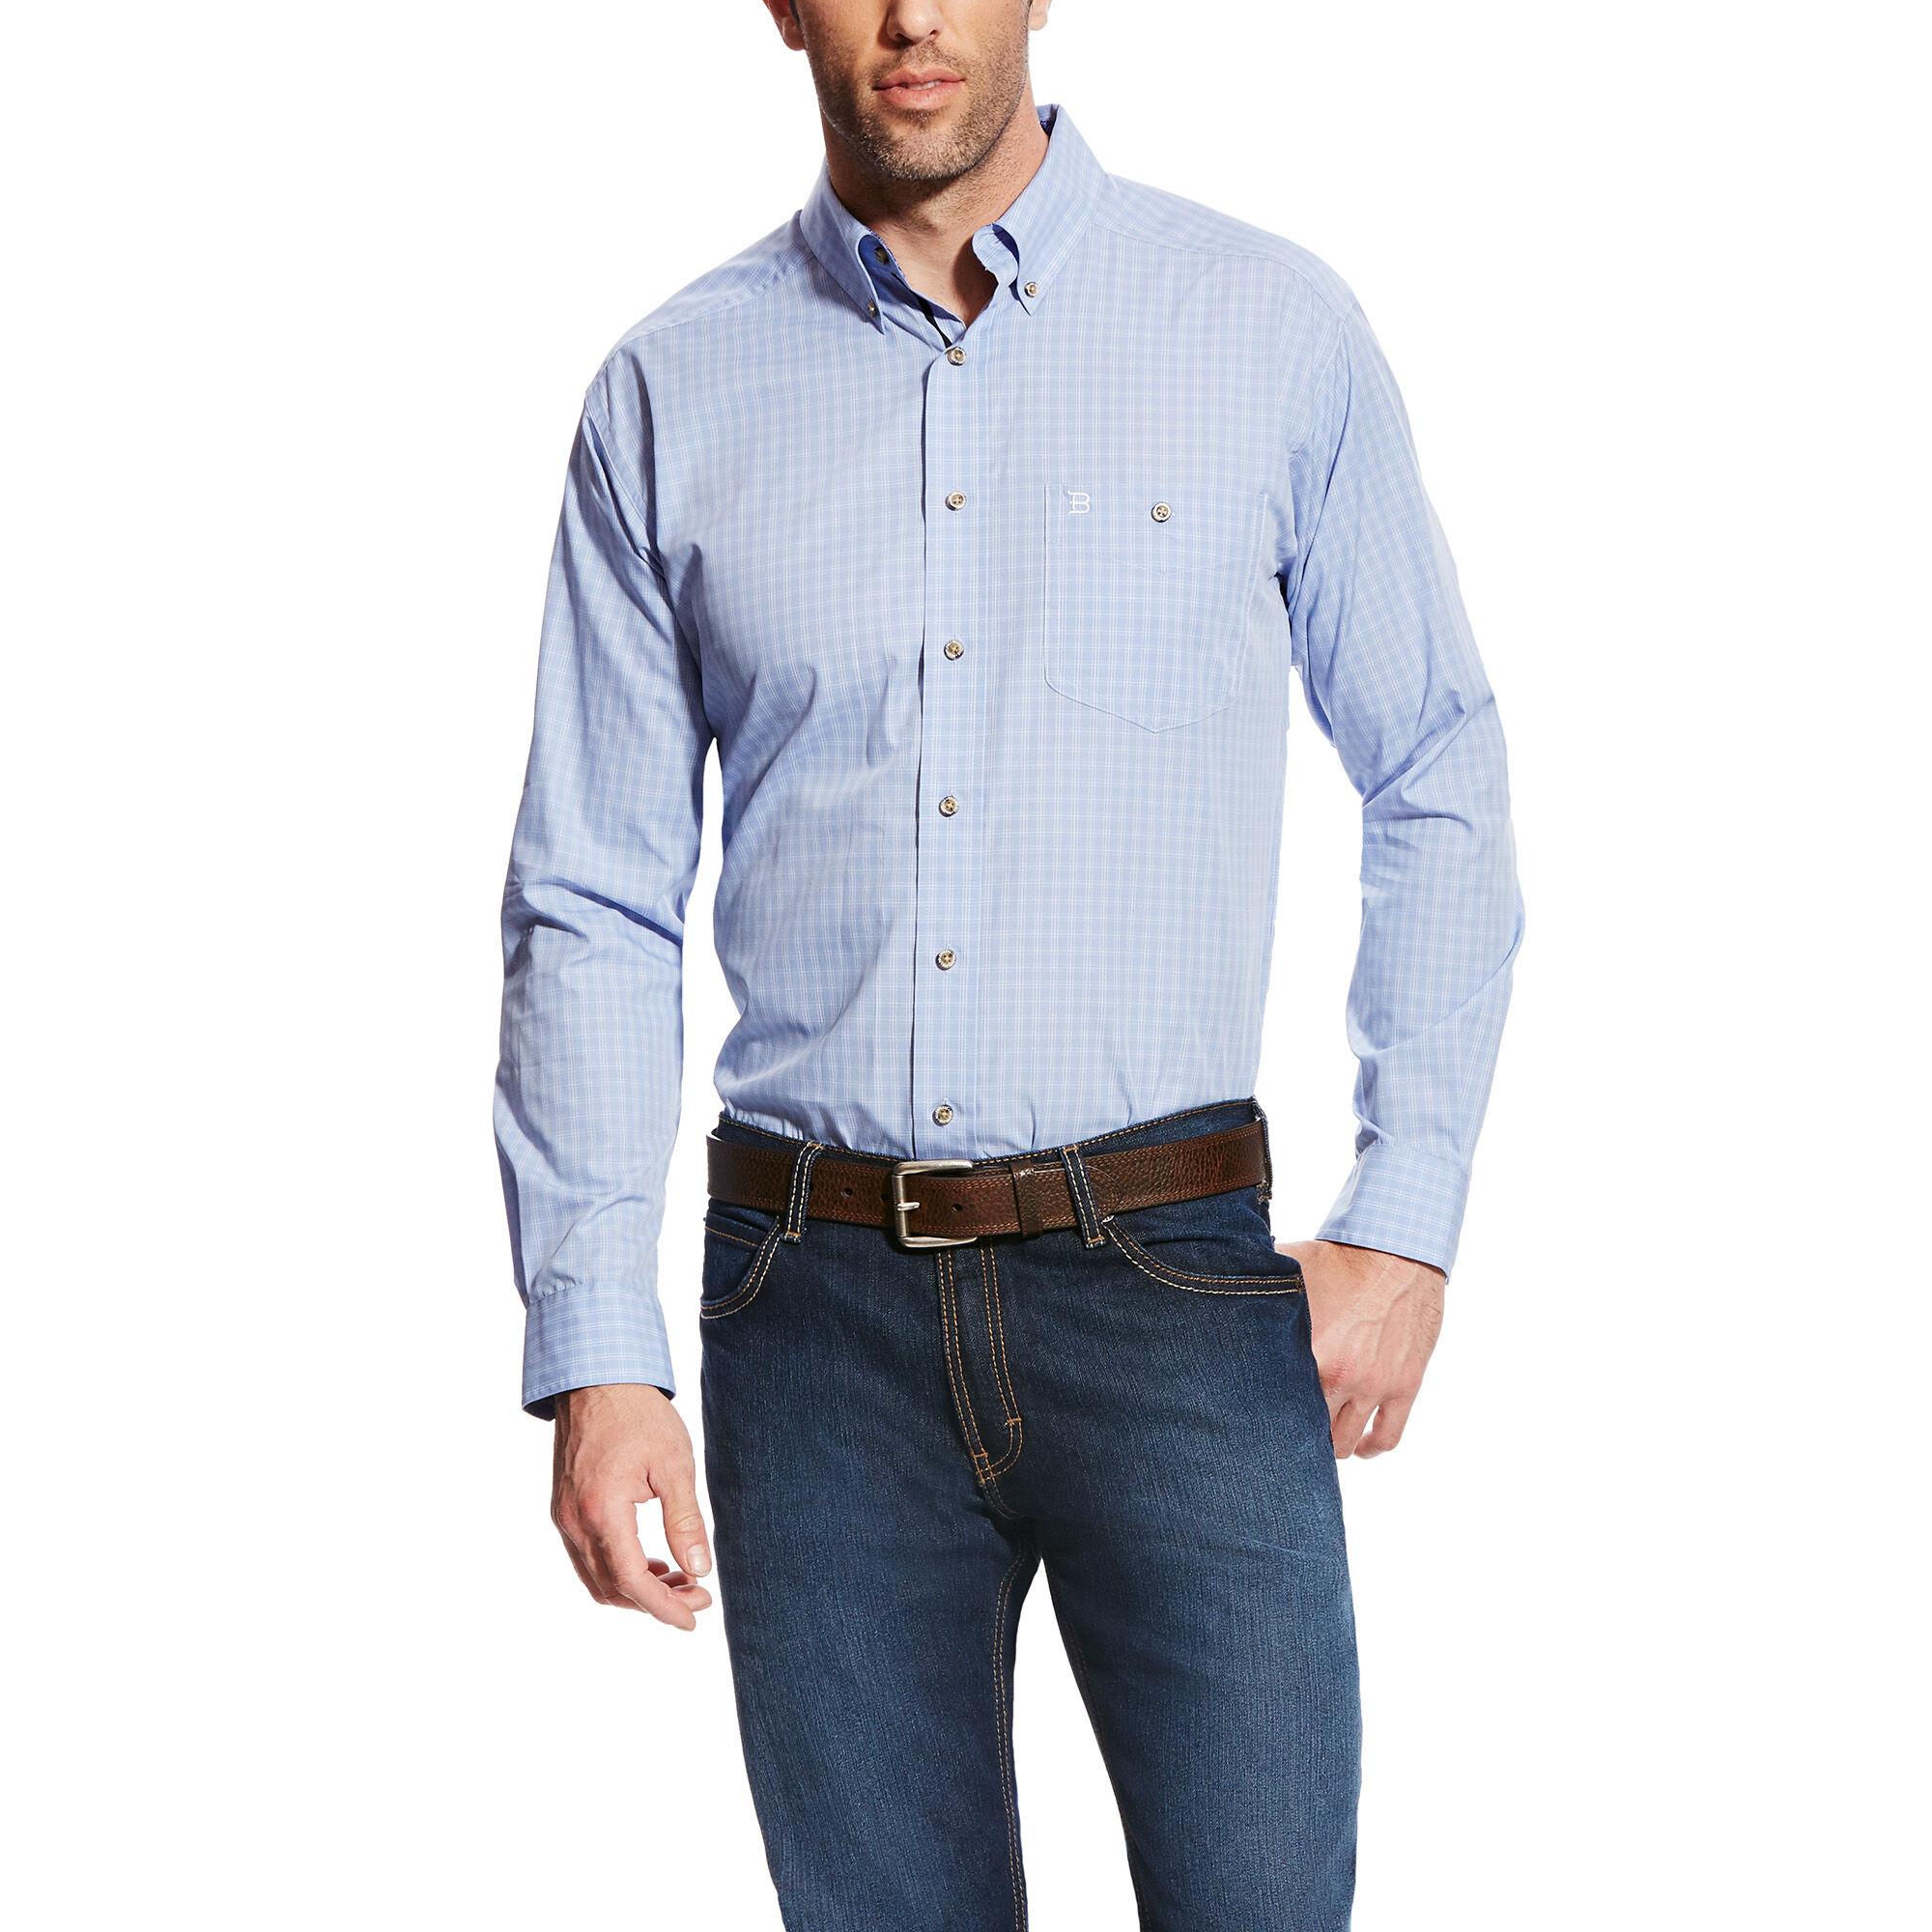 Relentless Velocious Shirt